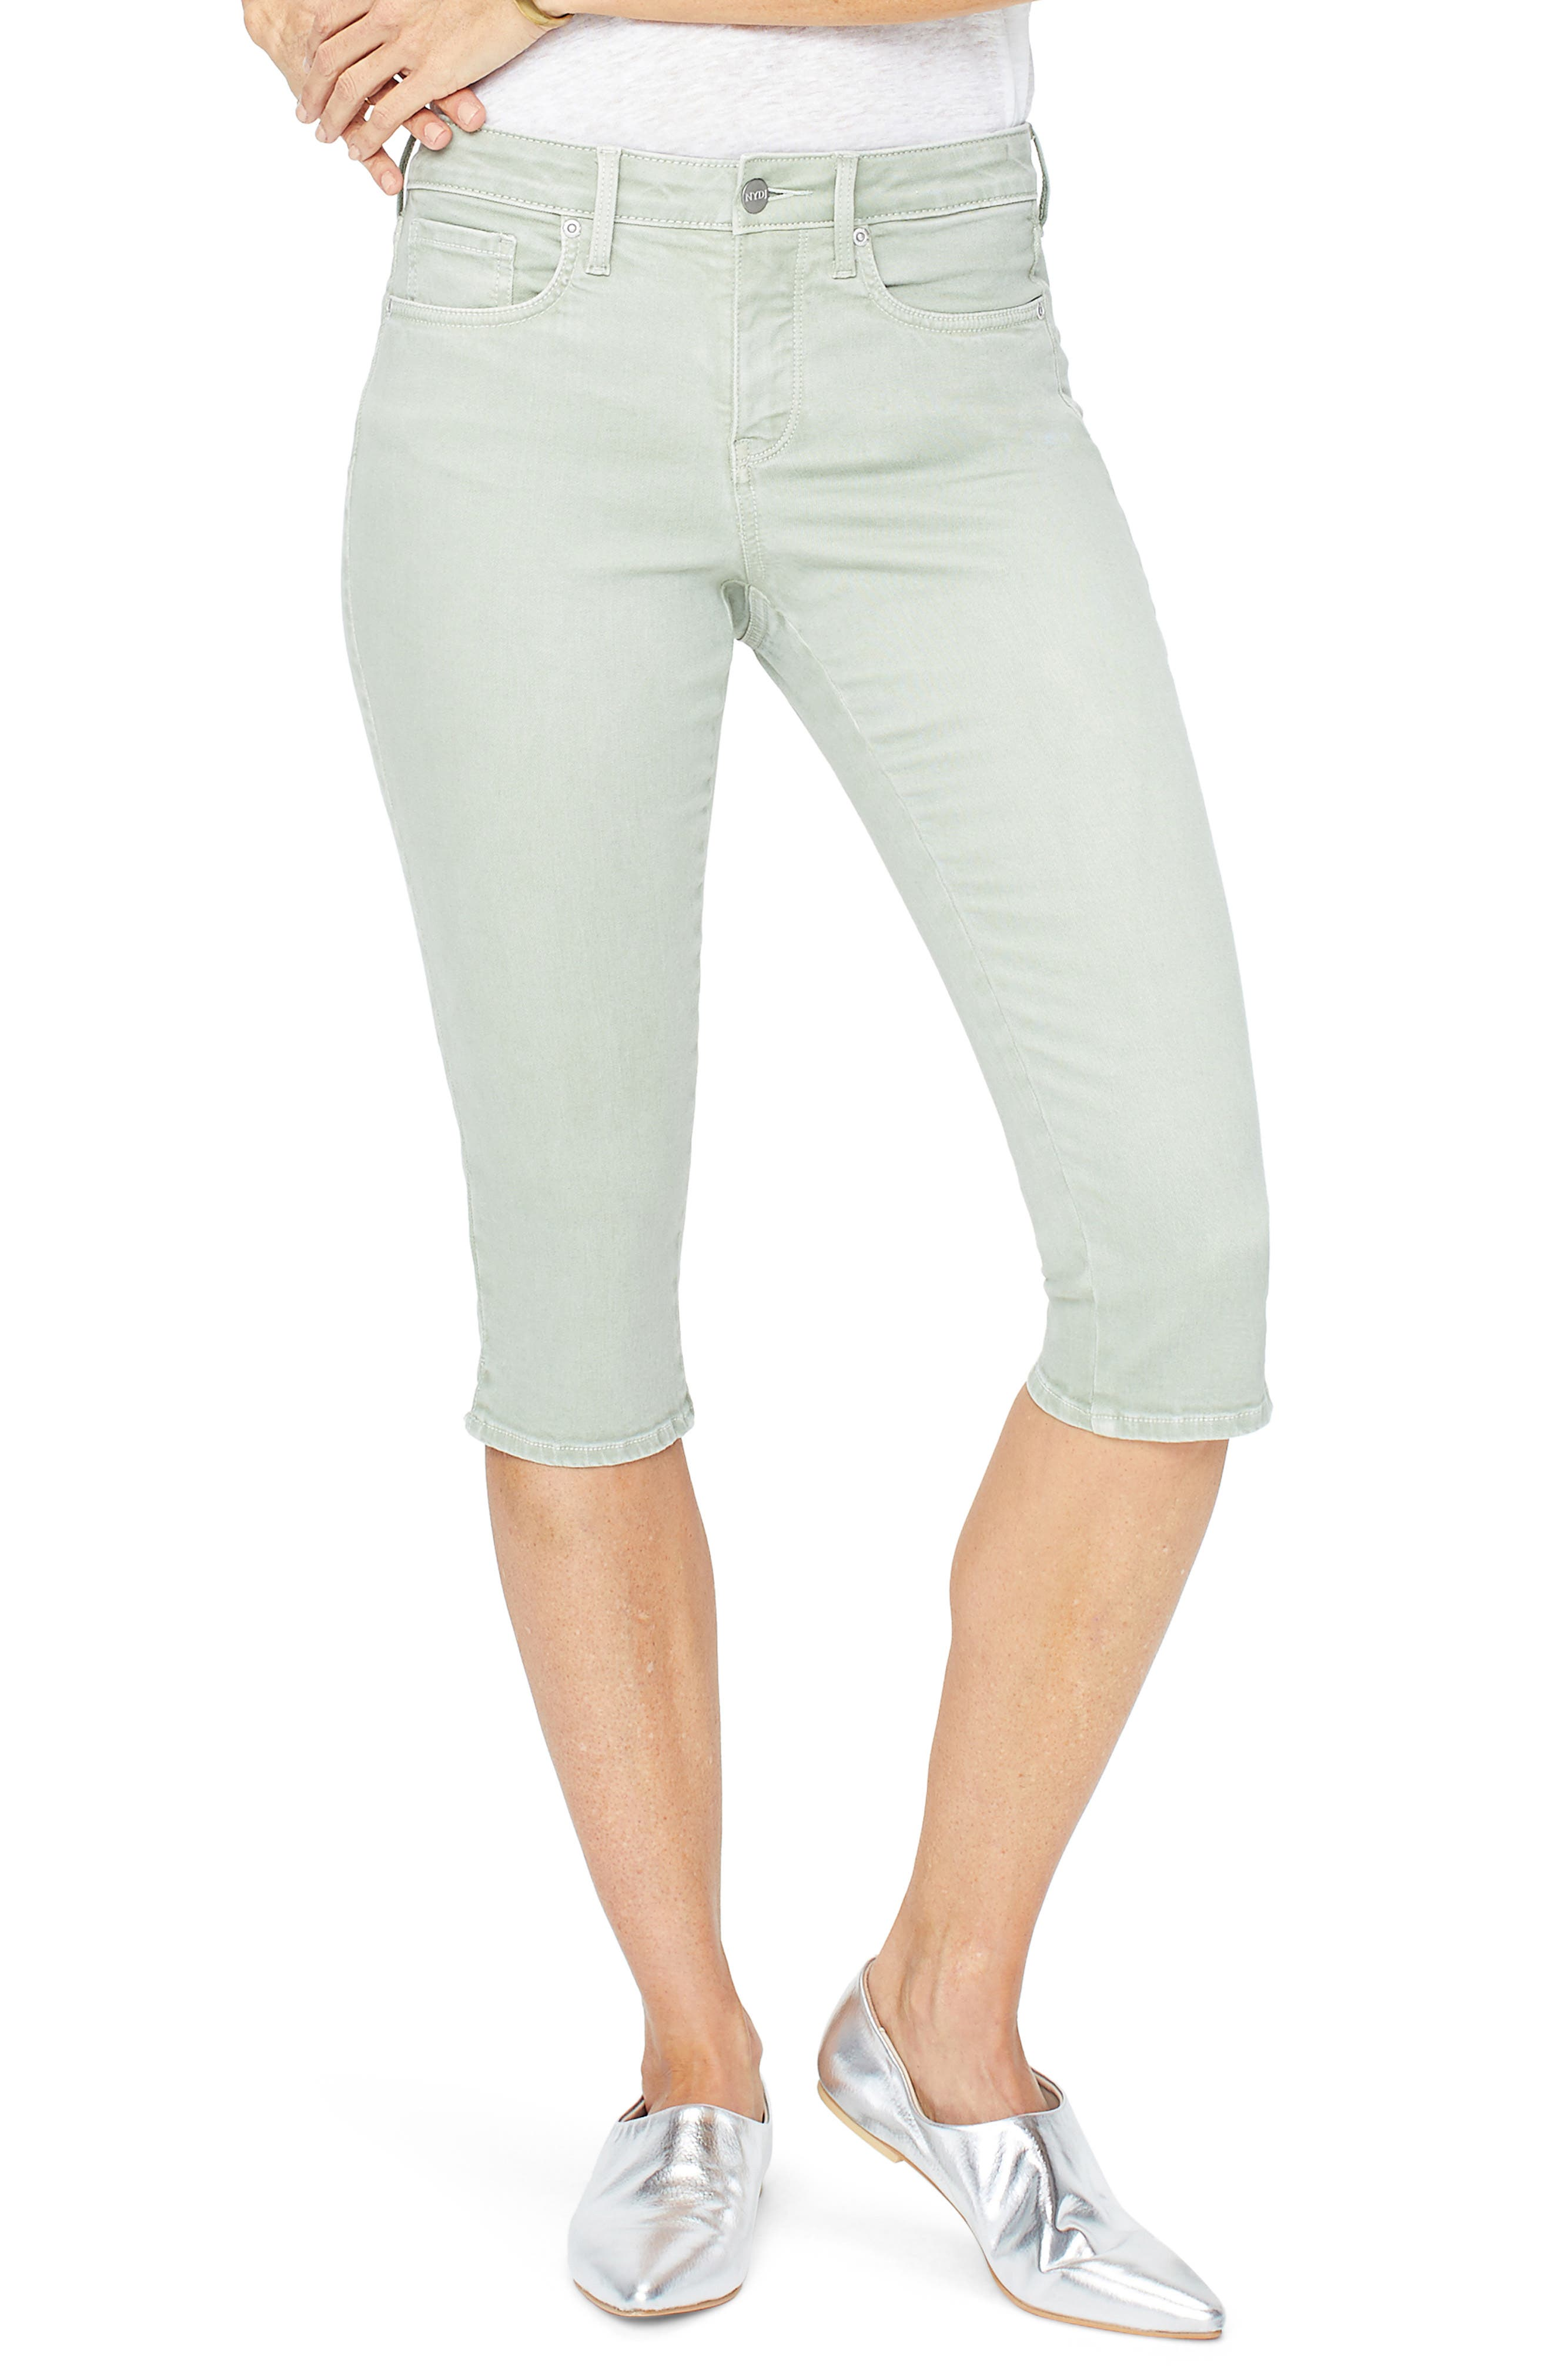 Nydj Capri Skinny Jeans, Green